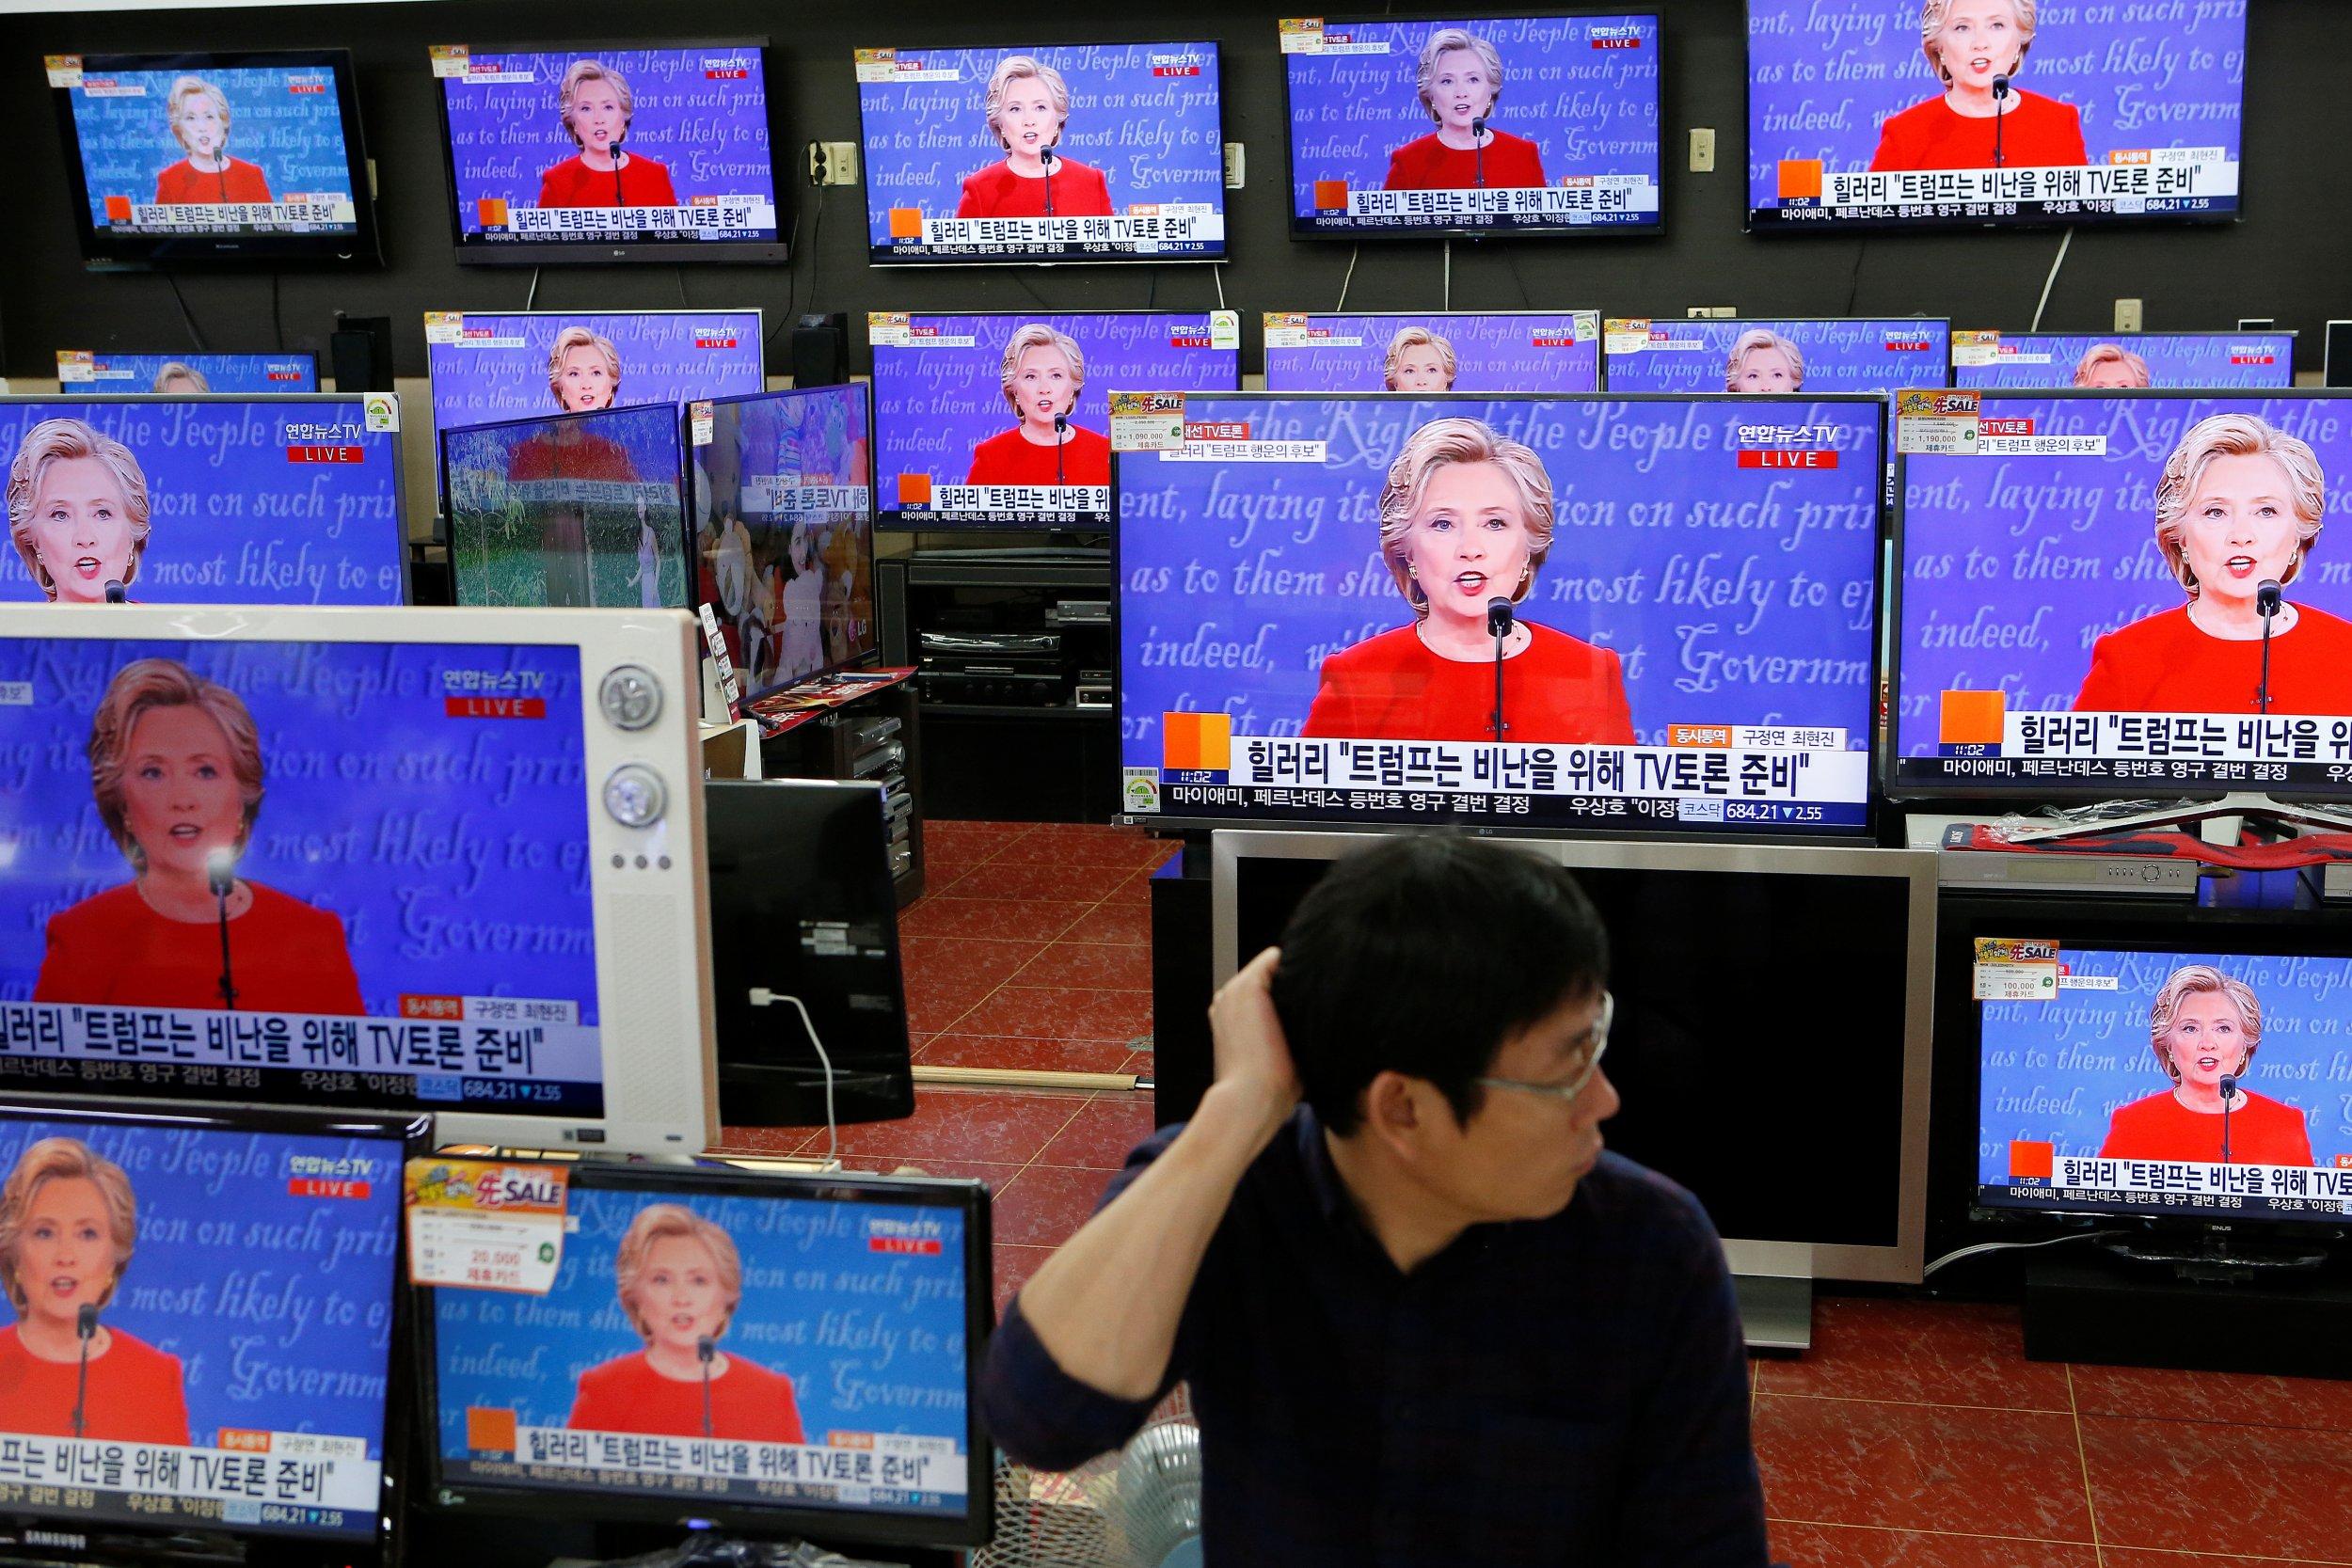 Clinton TV debate